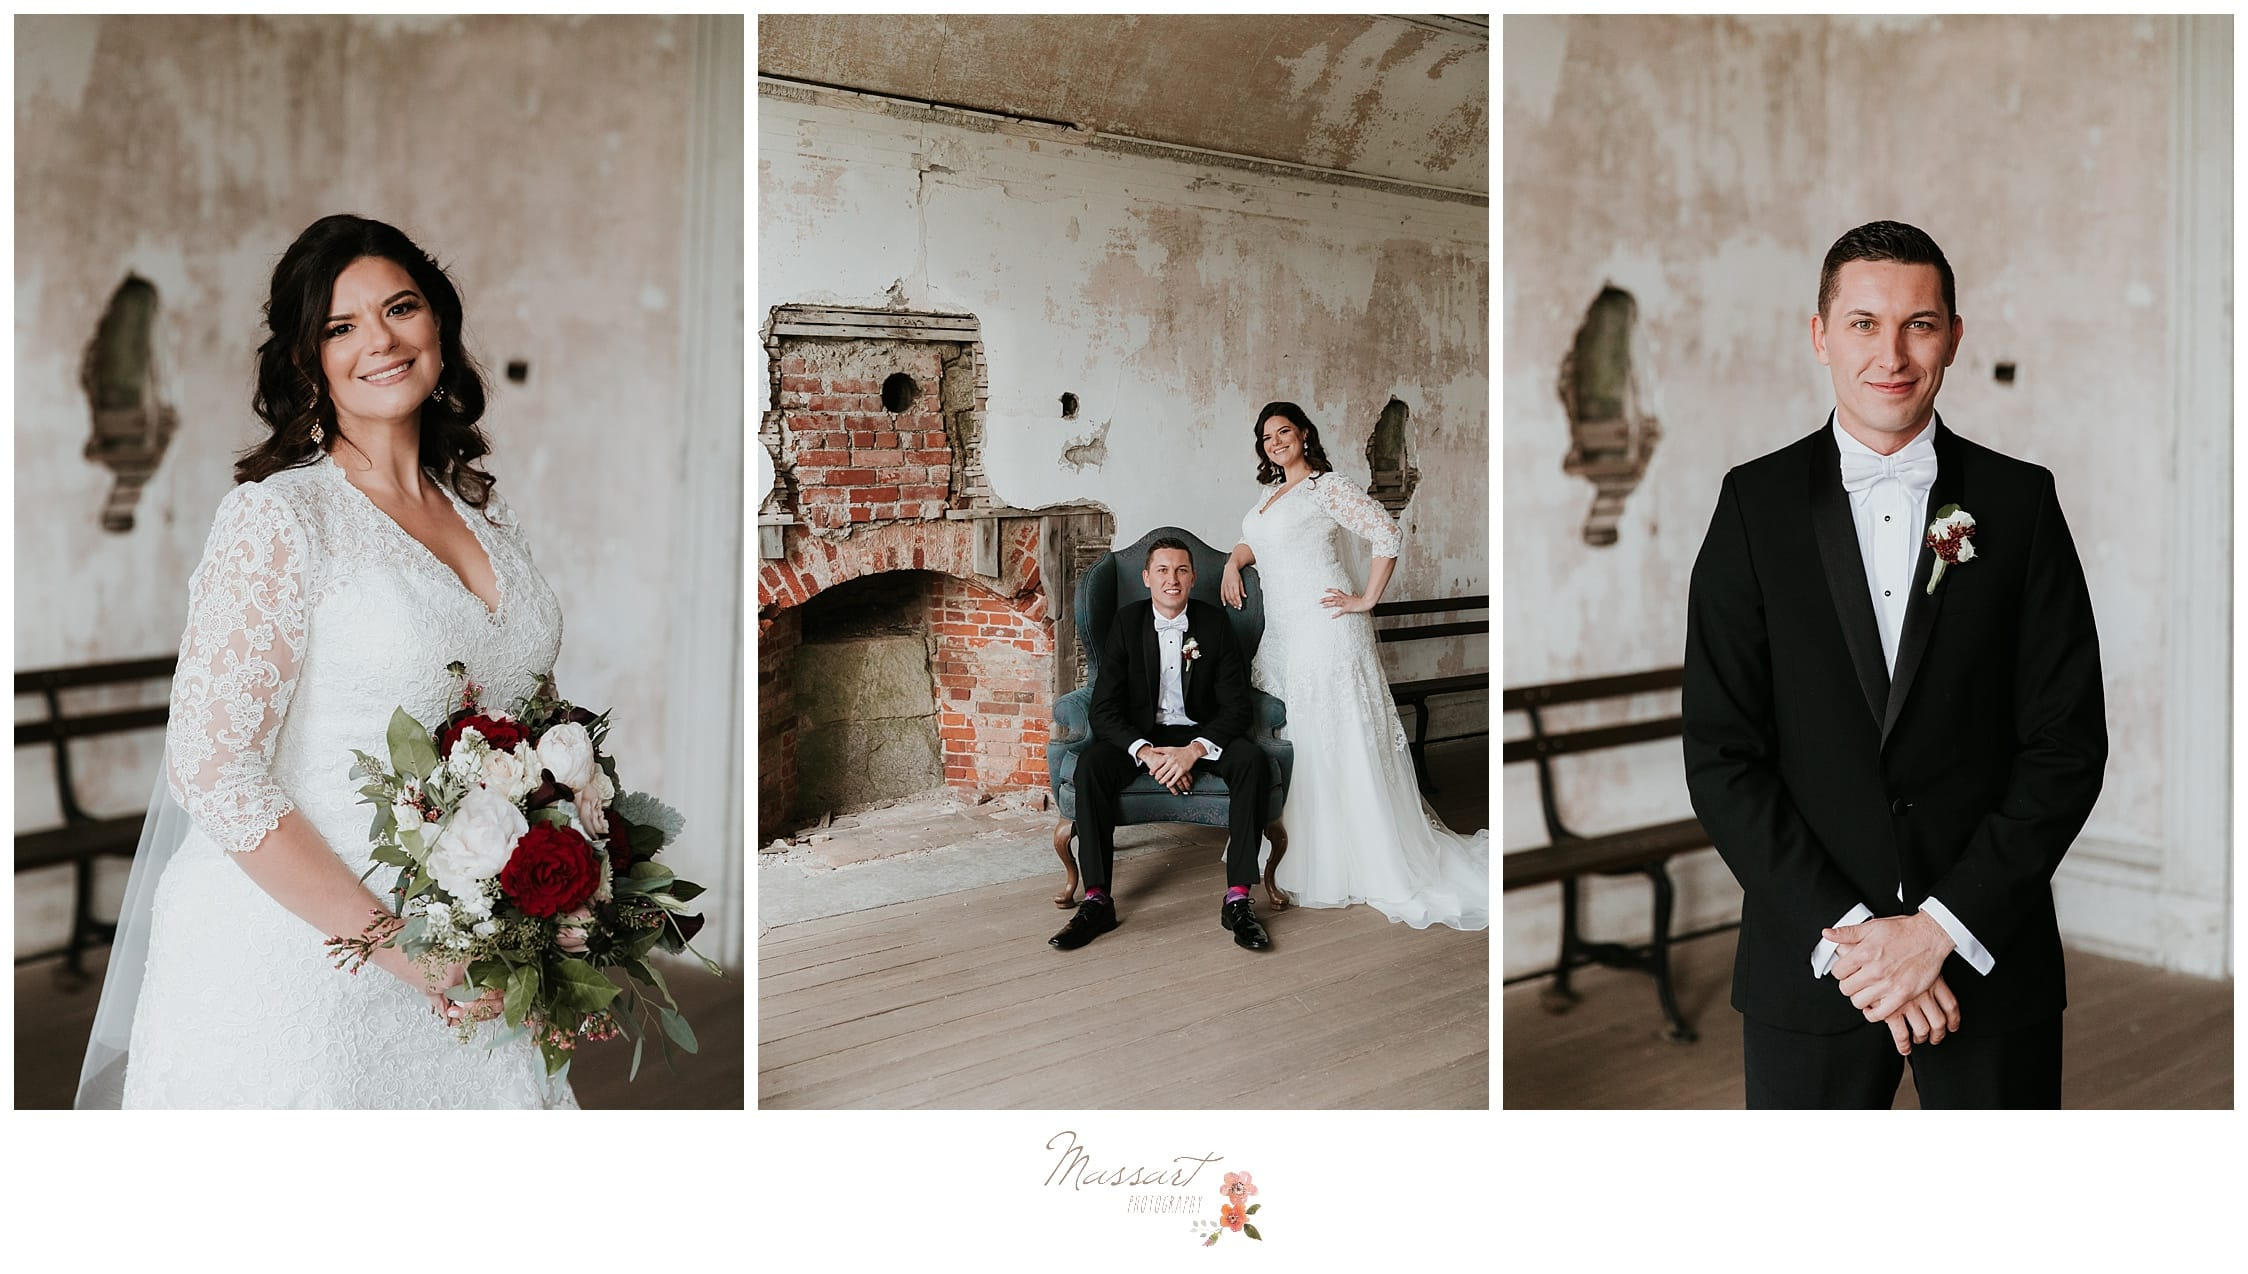 Wedding photos at fort adams in newport, Rhode Island taken by Massart Photographers of RI